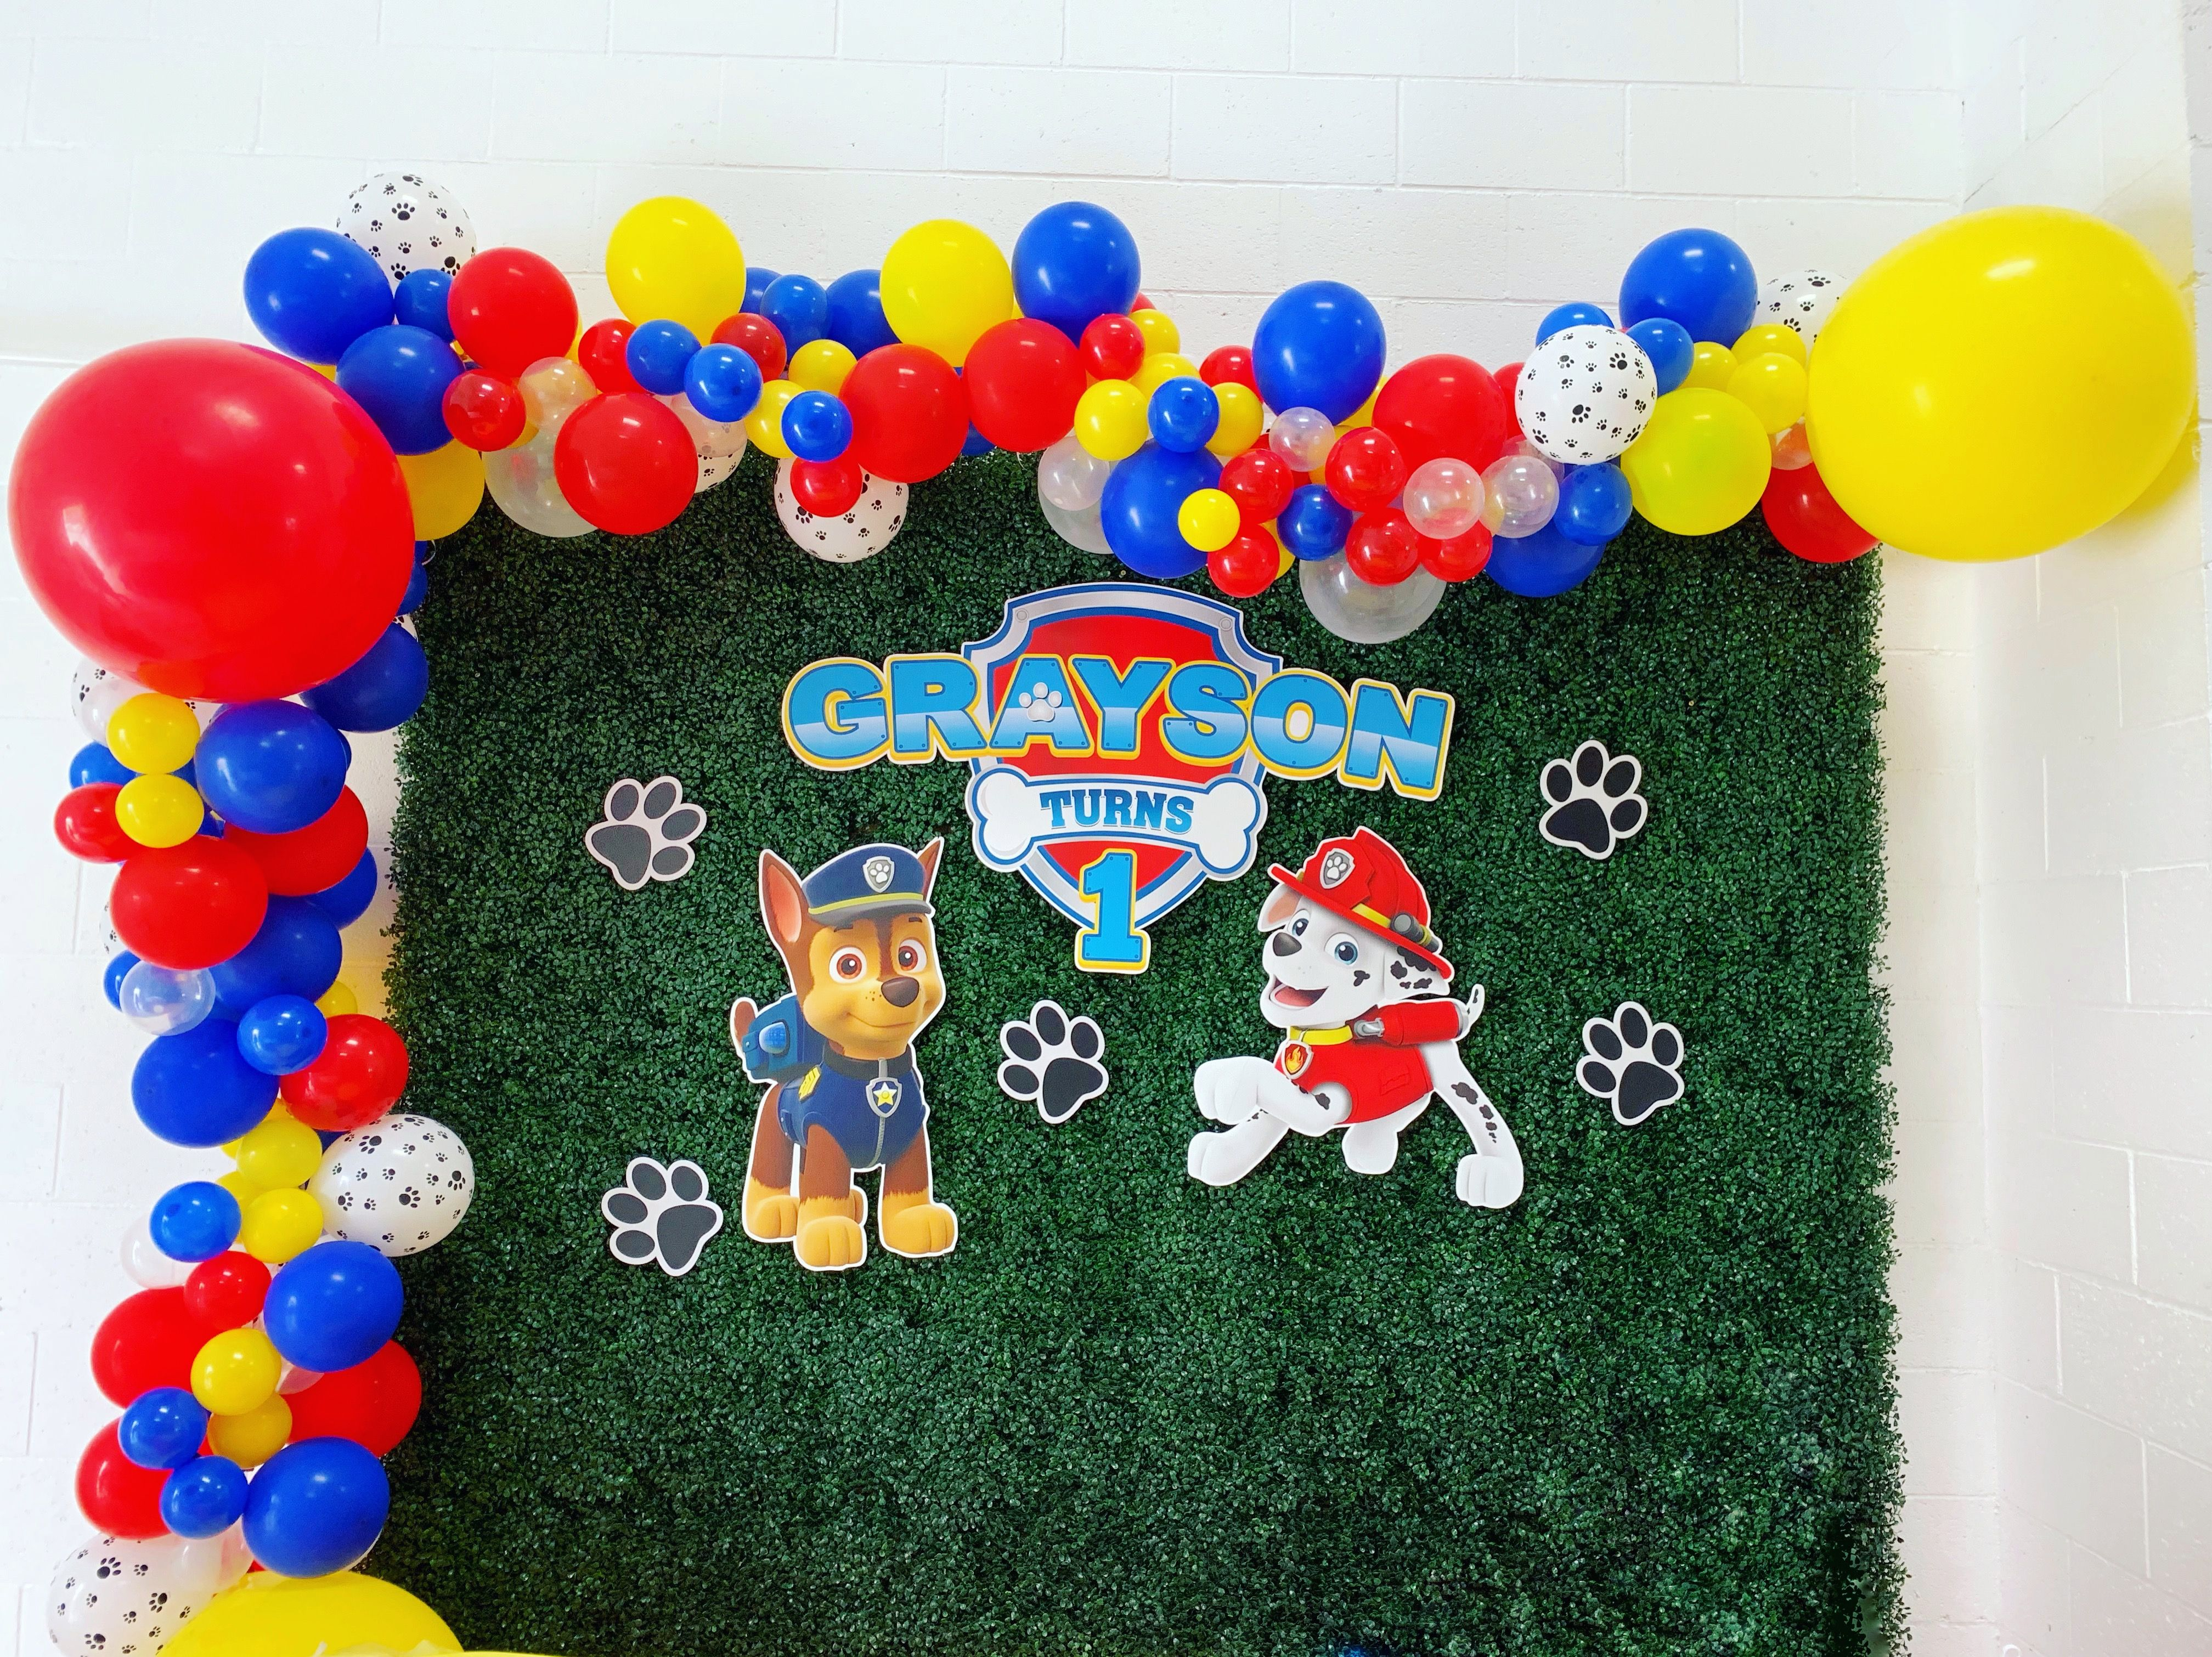 PAW PATROL Boys Girls Birthday Party Supplies Decorations Sprinkles CONFETTI